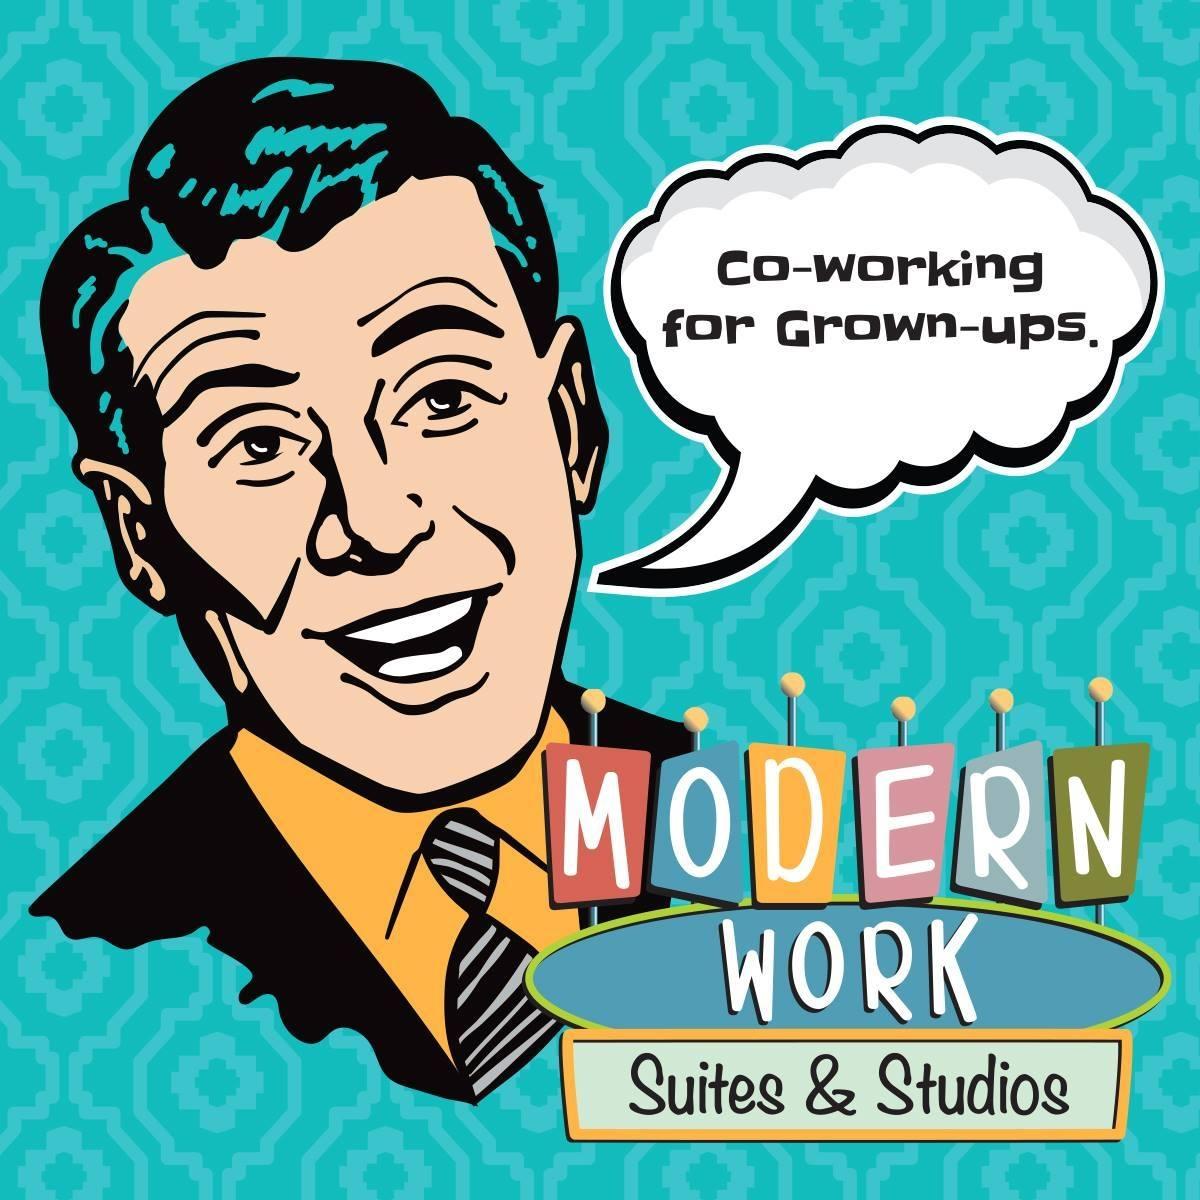 Park Place Apartments Omaha Ne: Modern Work Suites